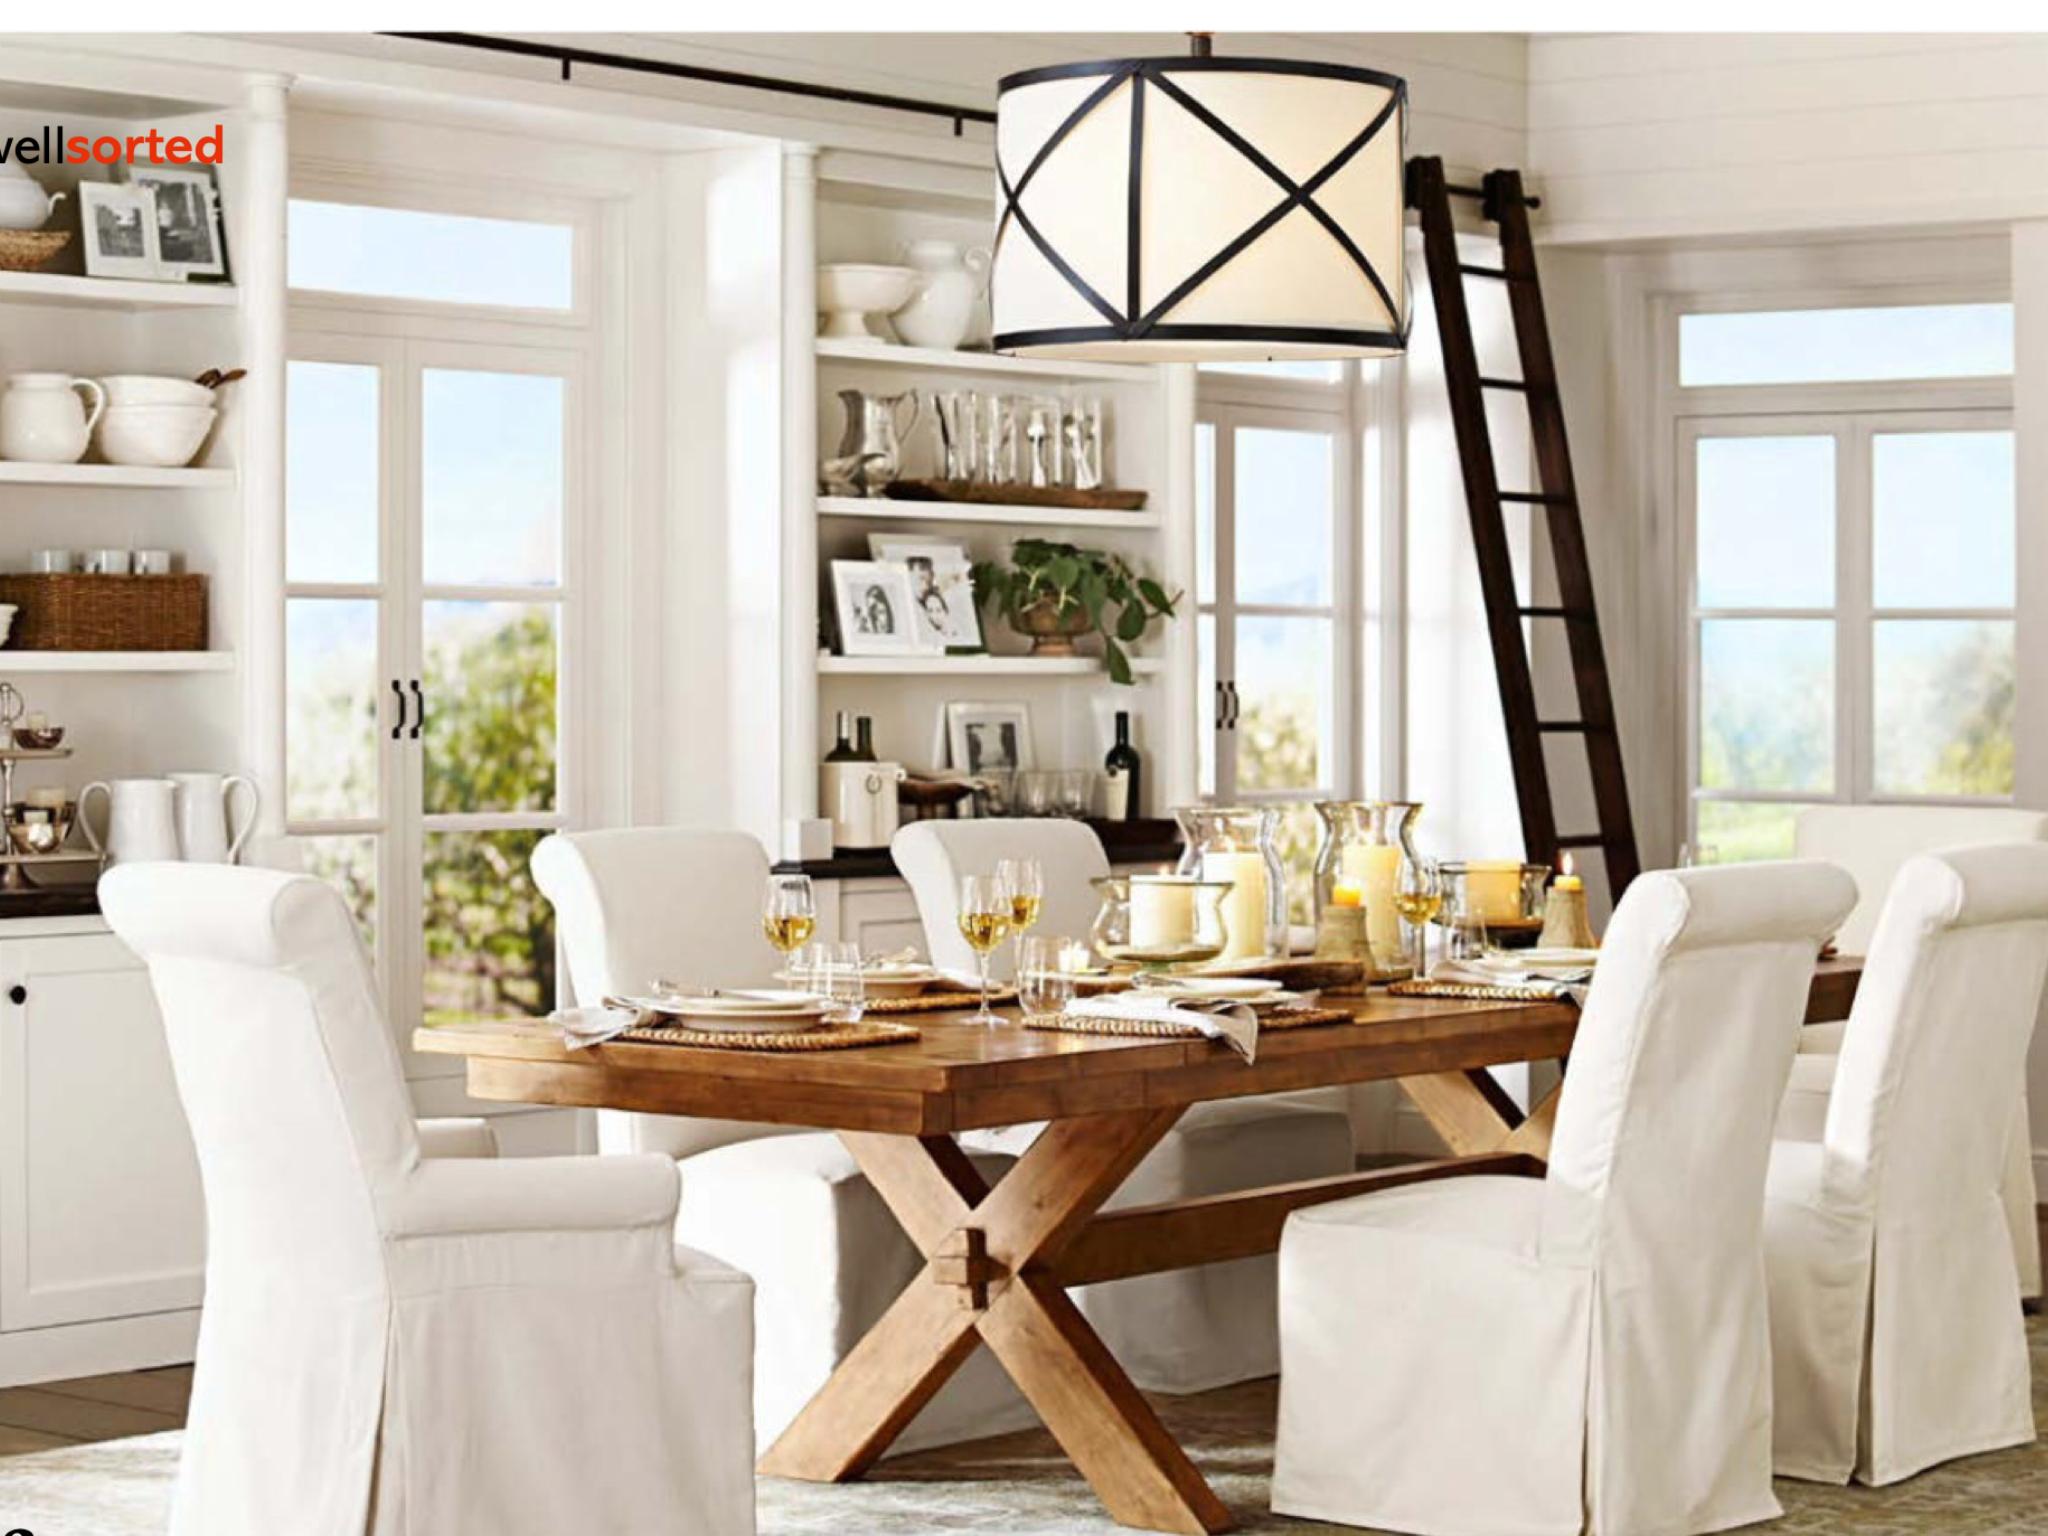 Better Homes & Gardens Australia  En Busca De Mis Preferidos Best Better Homes And Gardens Dining Room Design Ideas